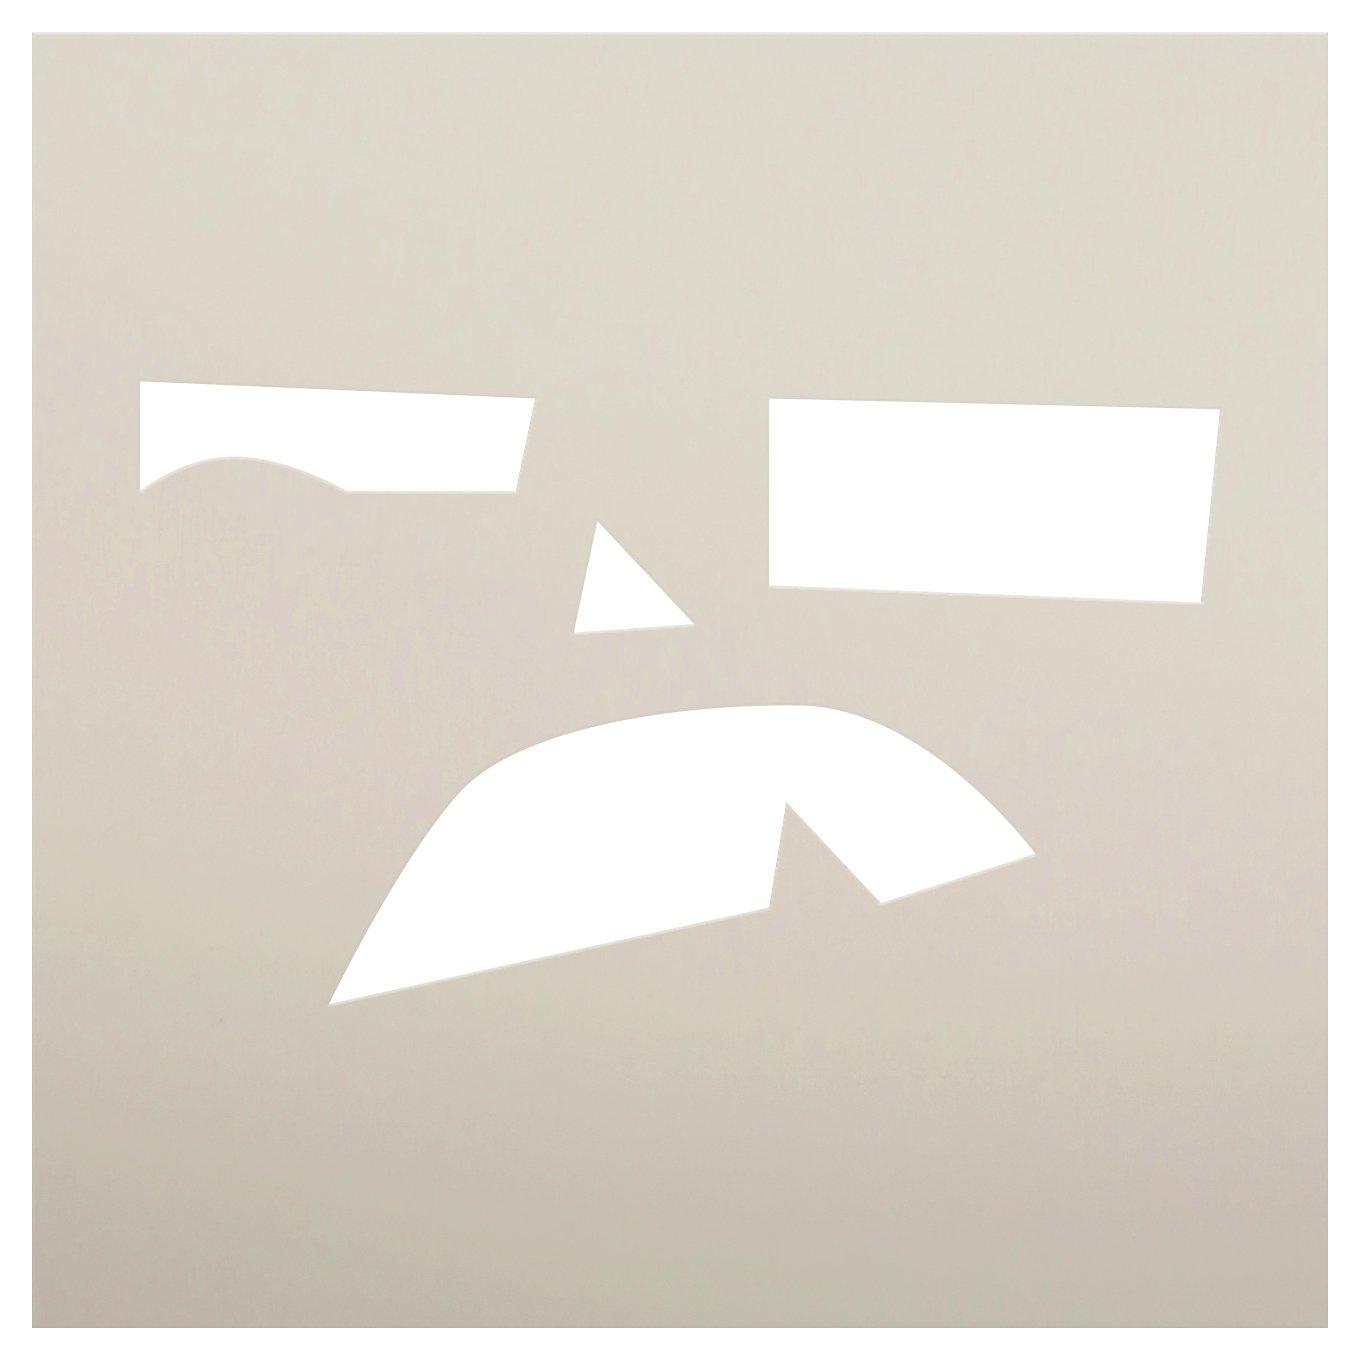 Monster Jack-O-Lantern Stencil by StudioR12 | Craft & Paint DIY Halloween Decor | Fall Pumpkin Face Pattern Template | Select Size